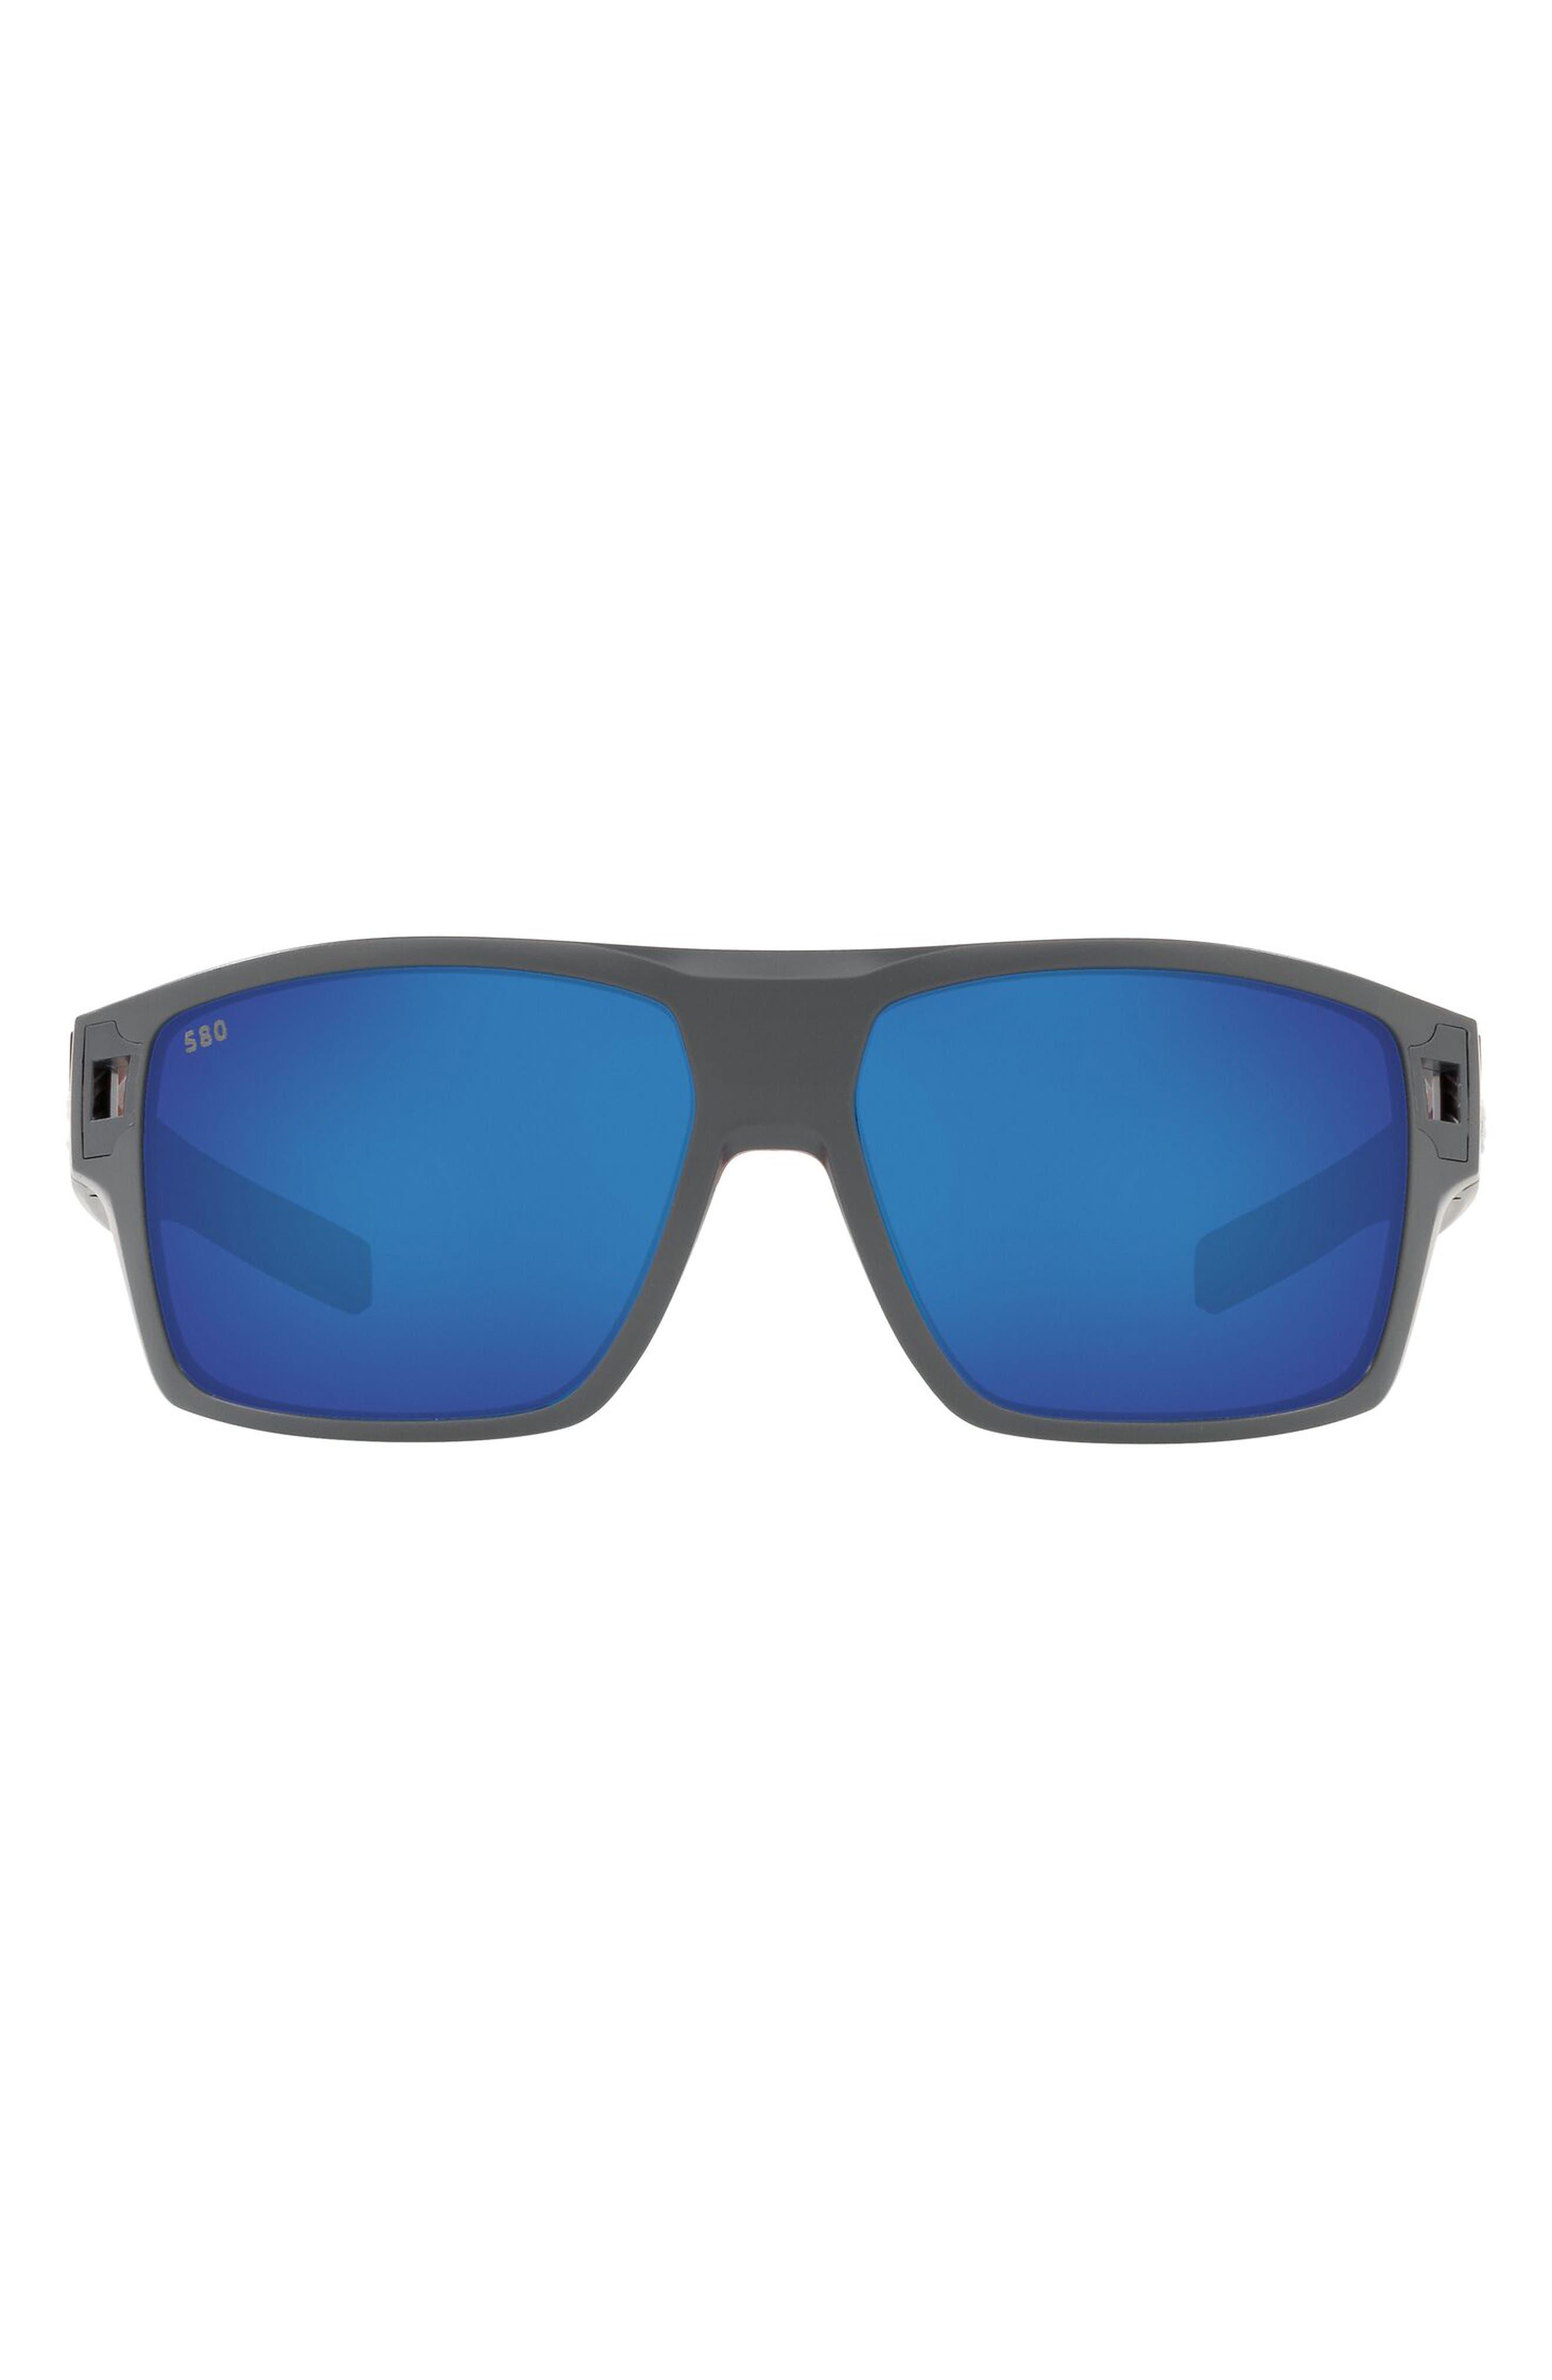 62mm Square Sunglasses